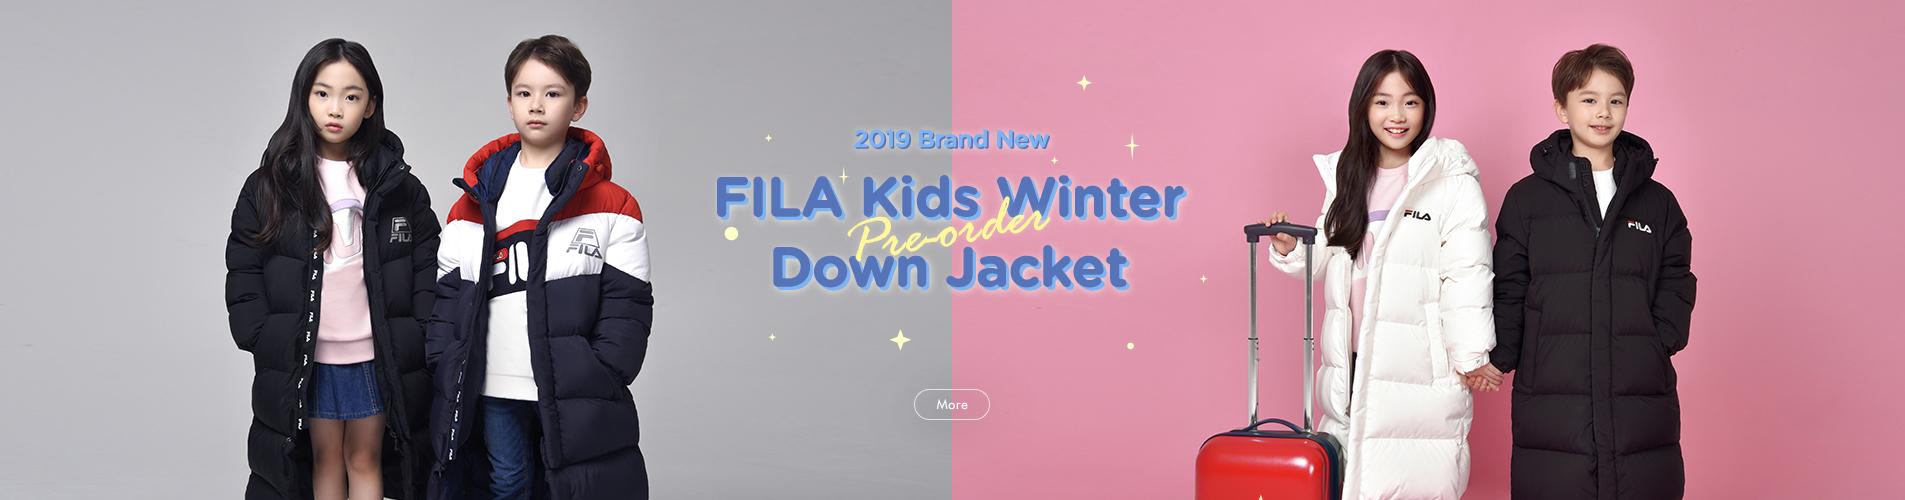 NEW FILA KIDS WINTER DOWN JACKET